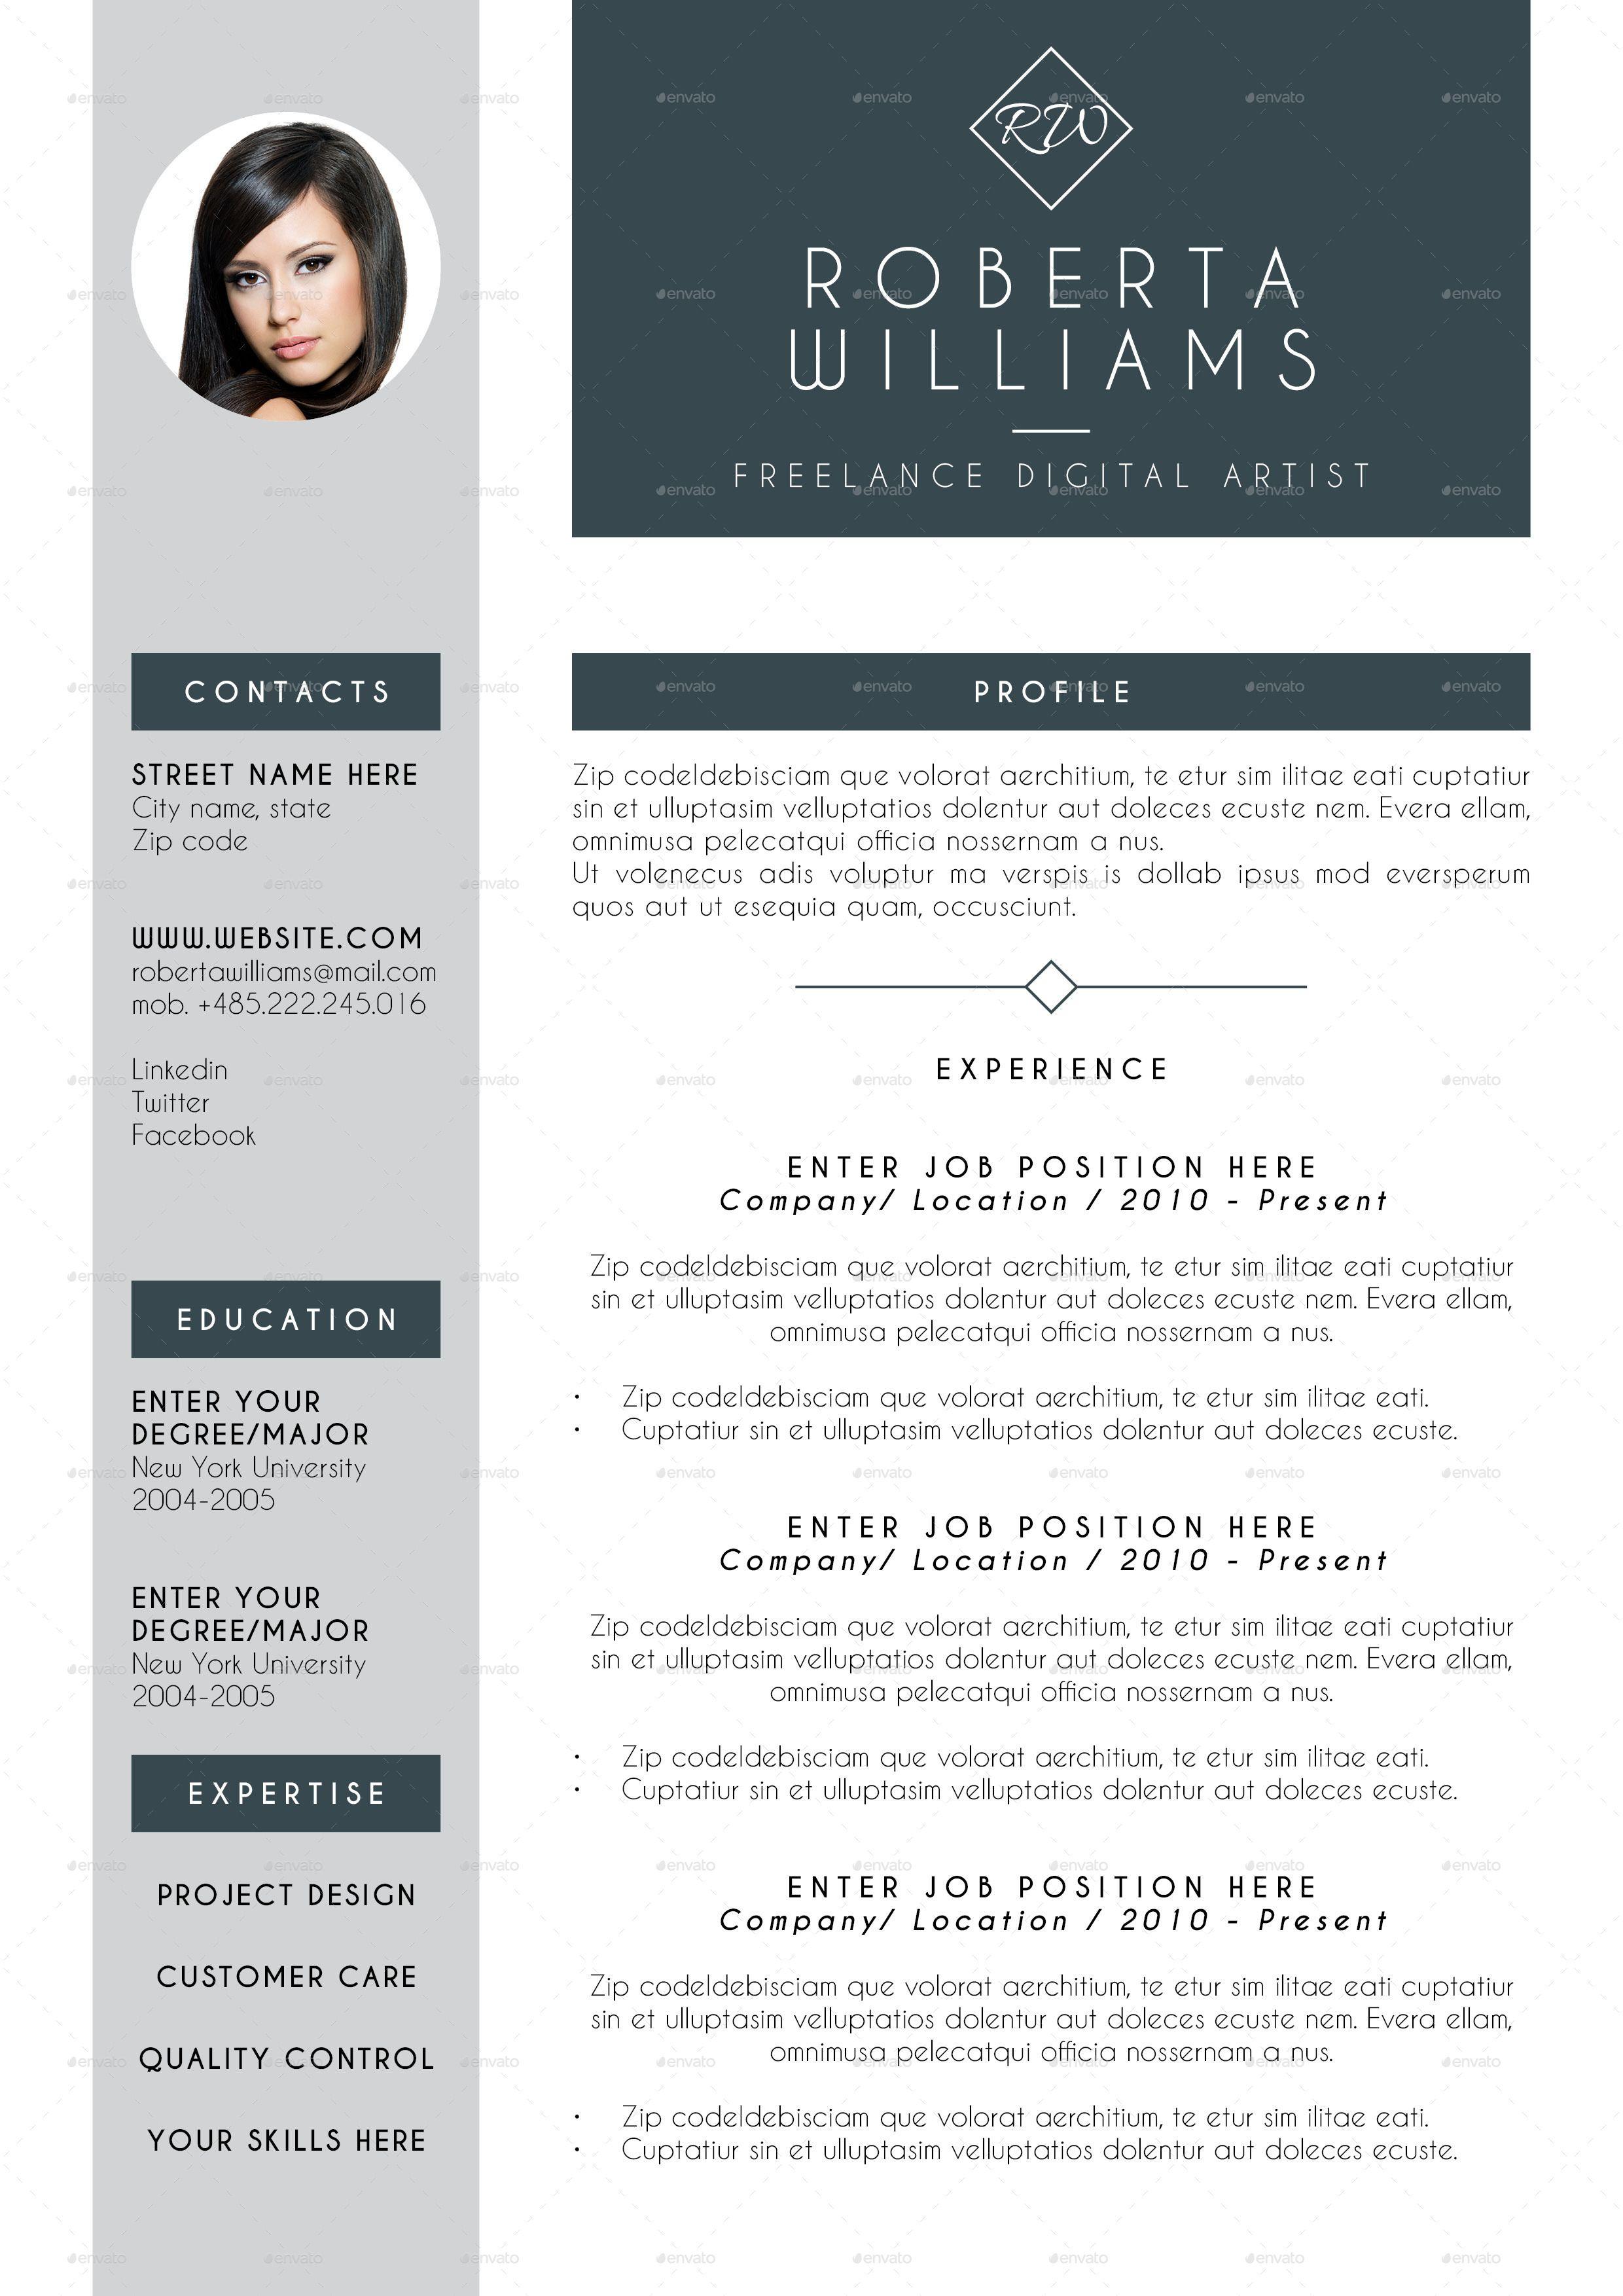 Professional Resume CV Indesign Template Indesign